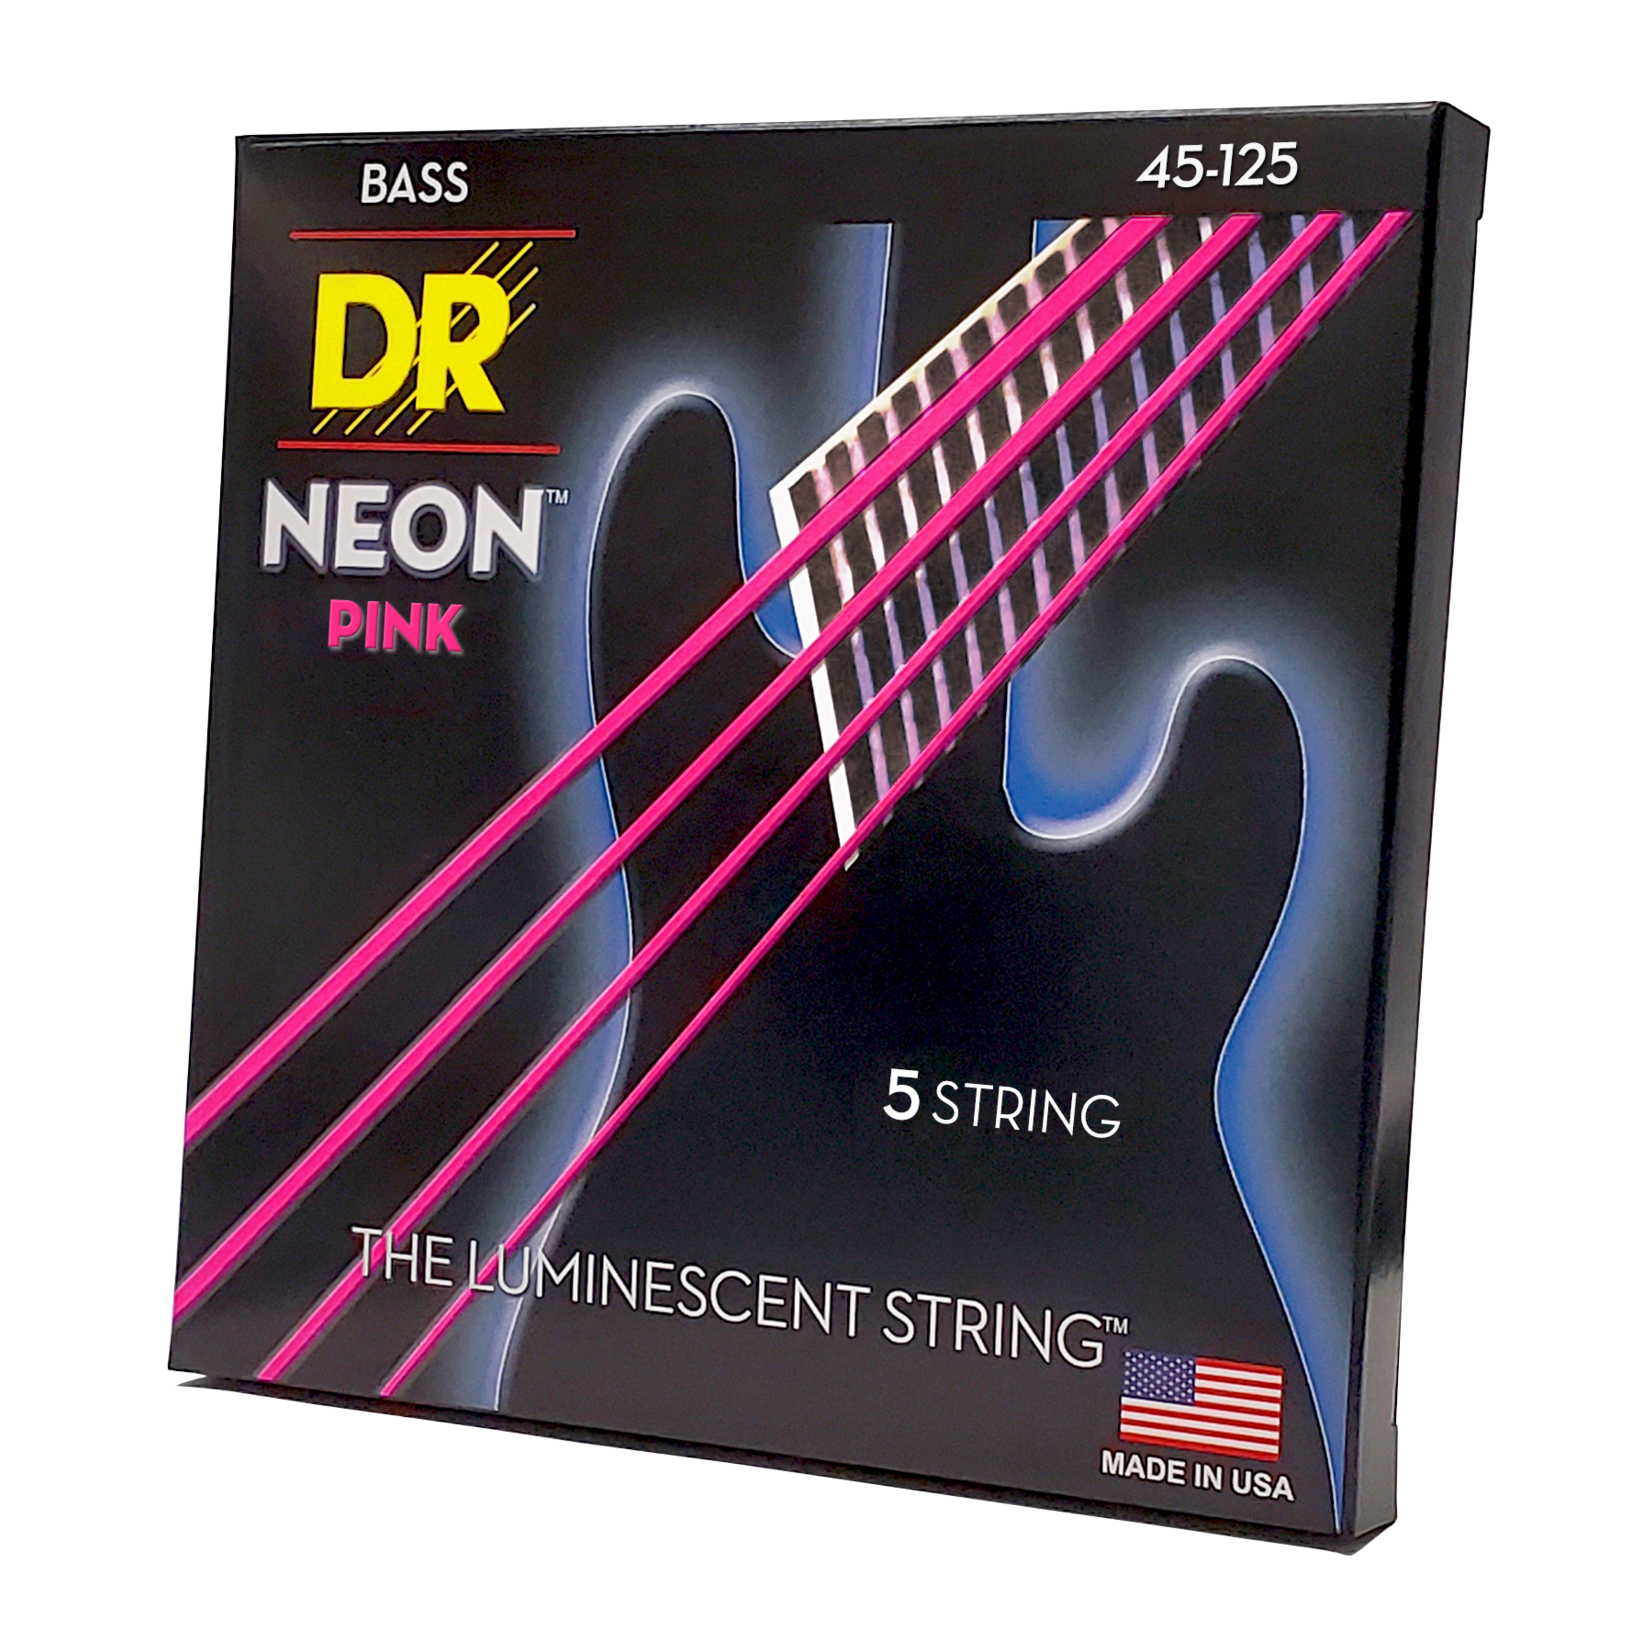 DR Strings DR Strings Neon Pink Bass Strings 5-String Set (45-125), K3 Coated, NPB5-45